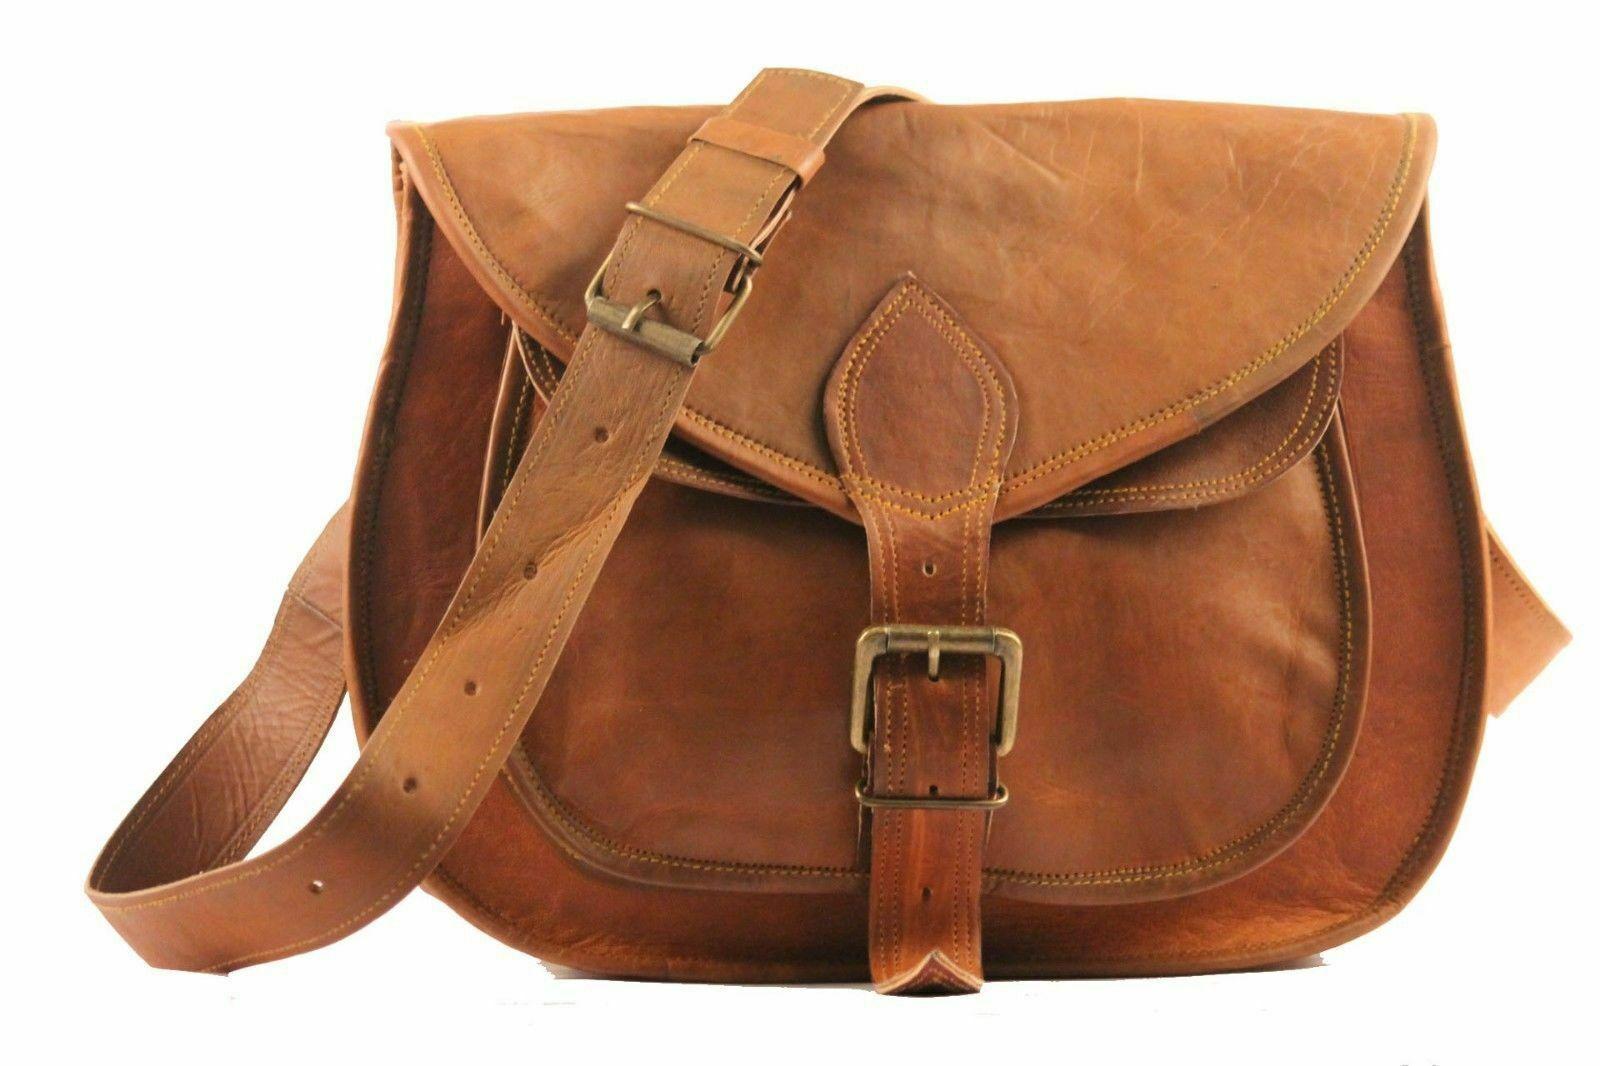 NEW Women/'s Vintage Leather Retro tote bag Satchel Shoulder briefcases Messenger